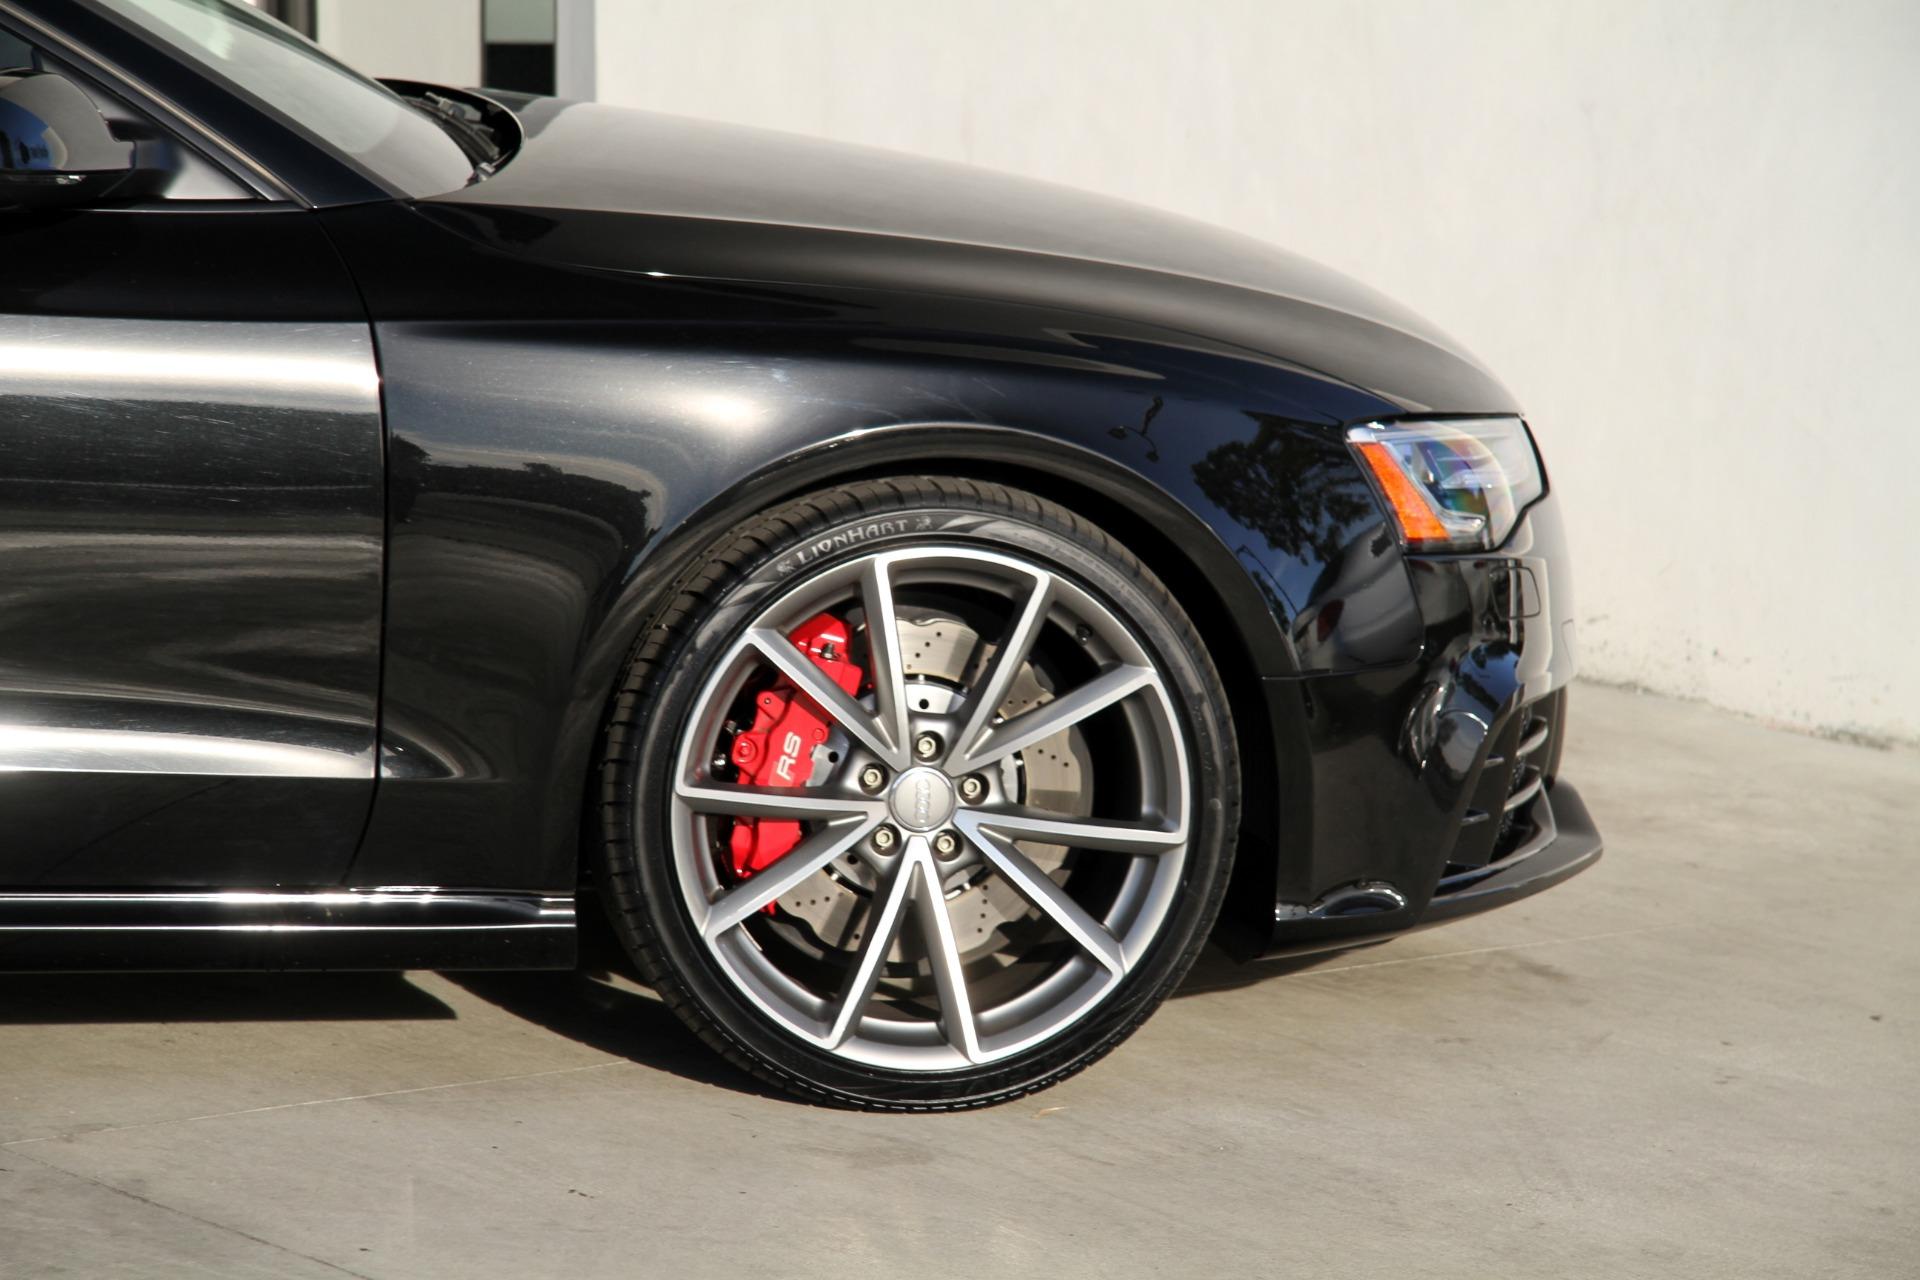 2015 Audi Rs 5 4 2 Quattro Stock 900956 For Sale Near